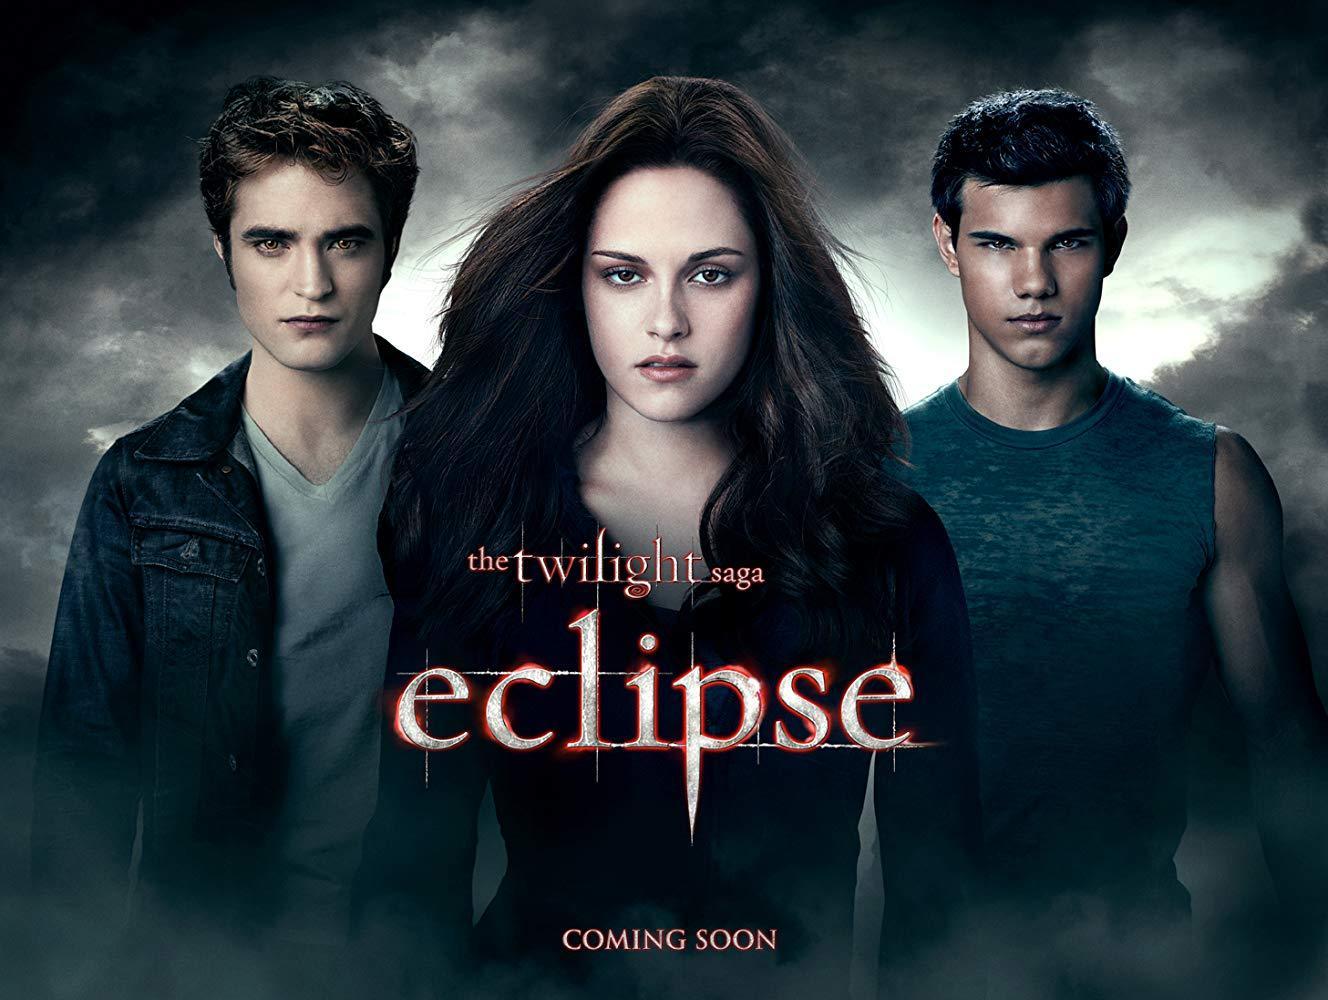 مشاهدة فيلم The Twilight Saga Eclipse 2010 HD مترجم كامل اون لاين